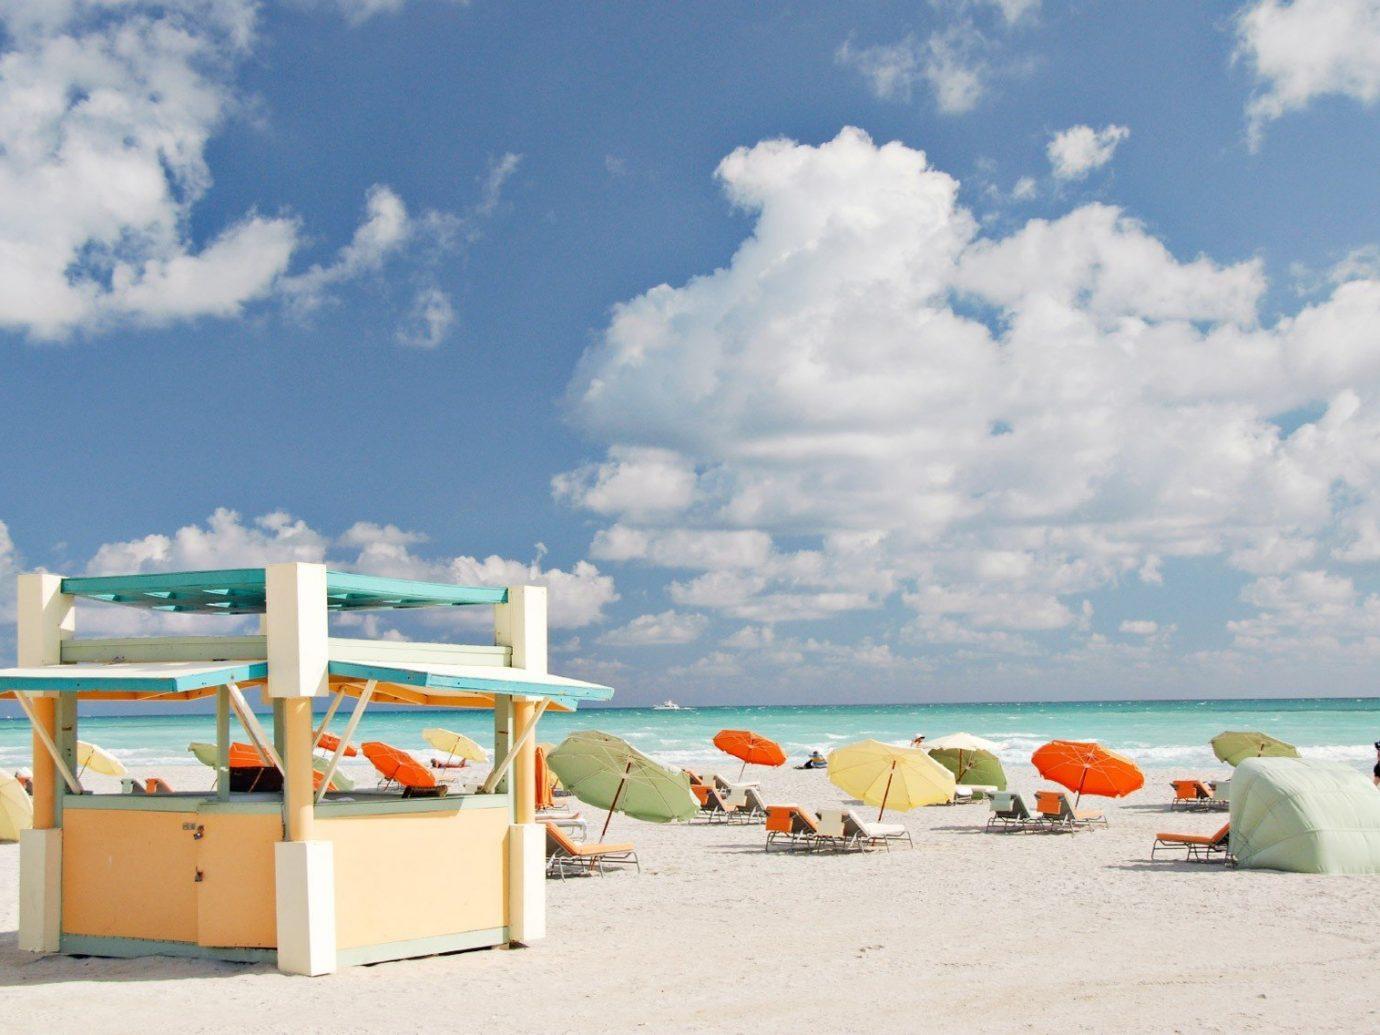 Trip Ideas sky Beach outdoor Sea body of water shore Ocean vacation Coast orange bay caribbean sand day